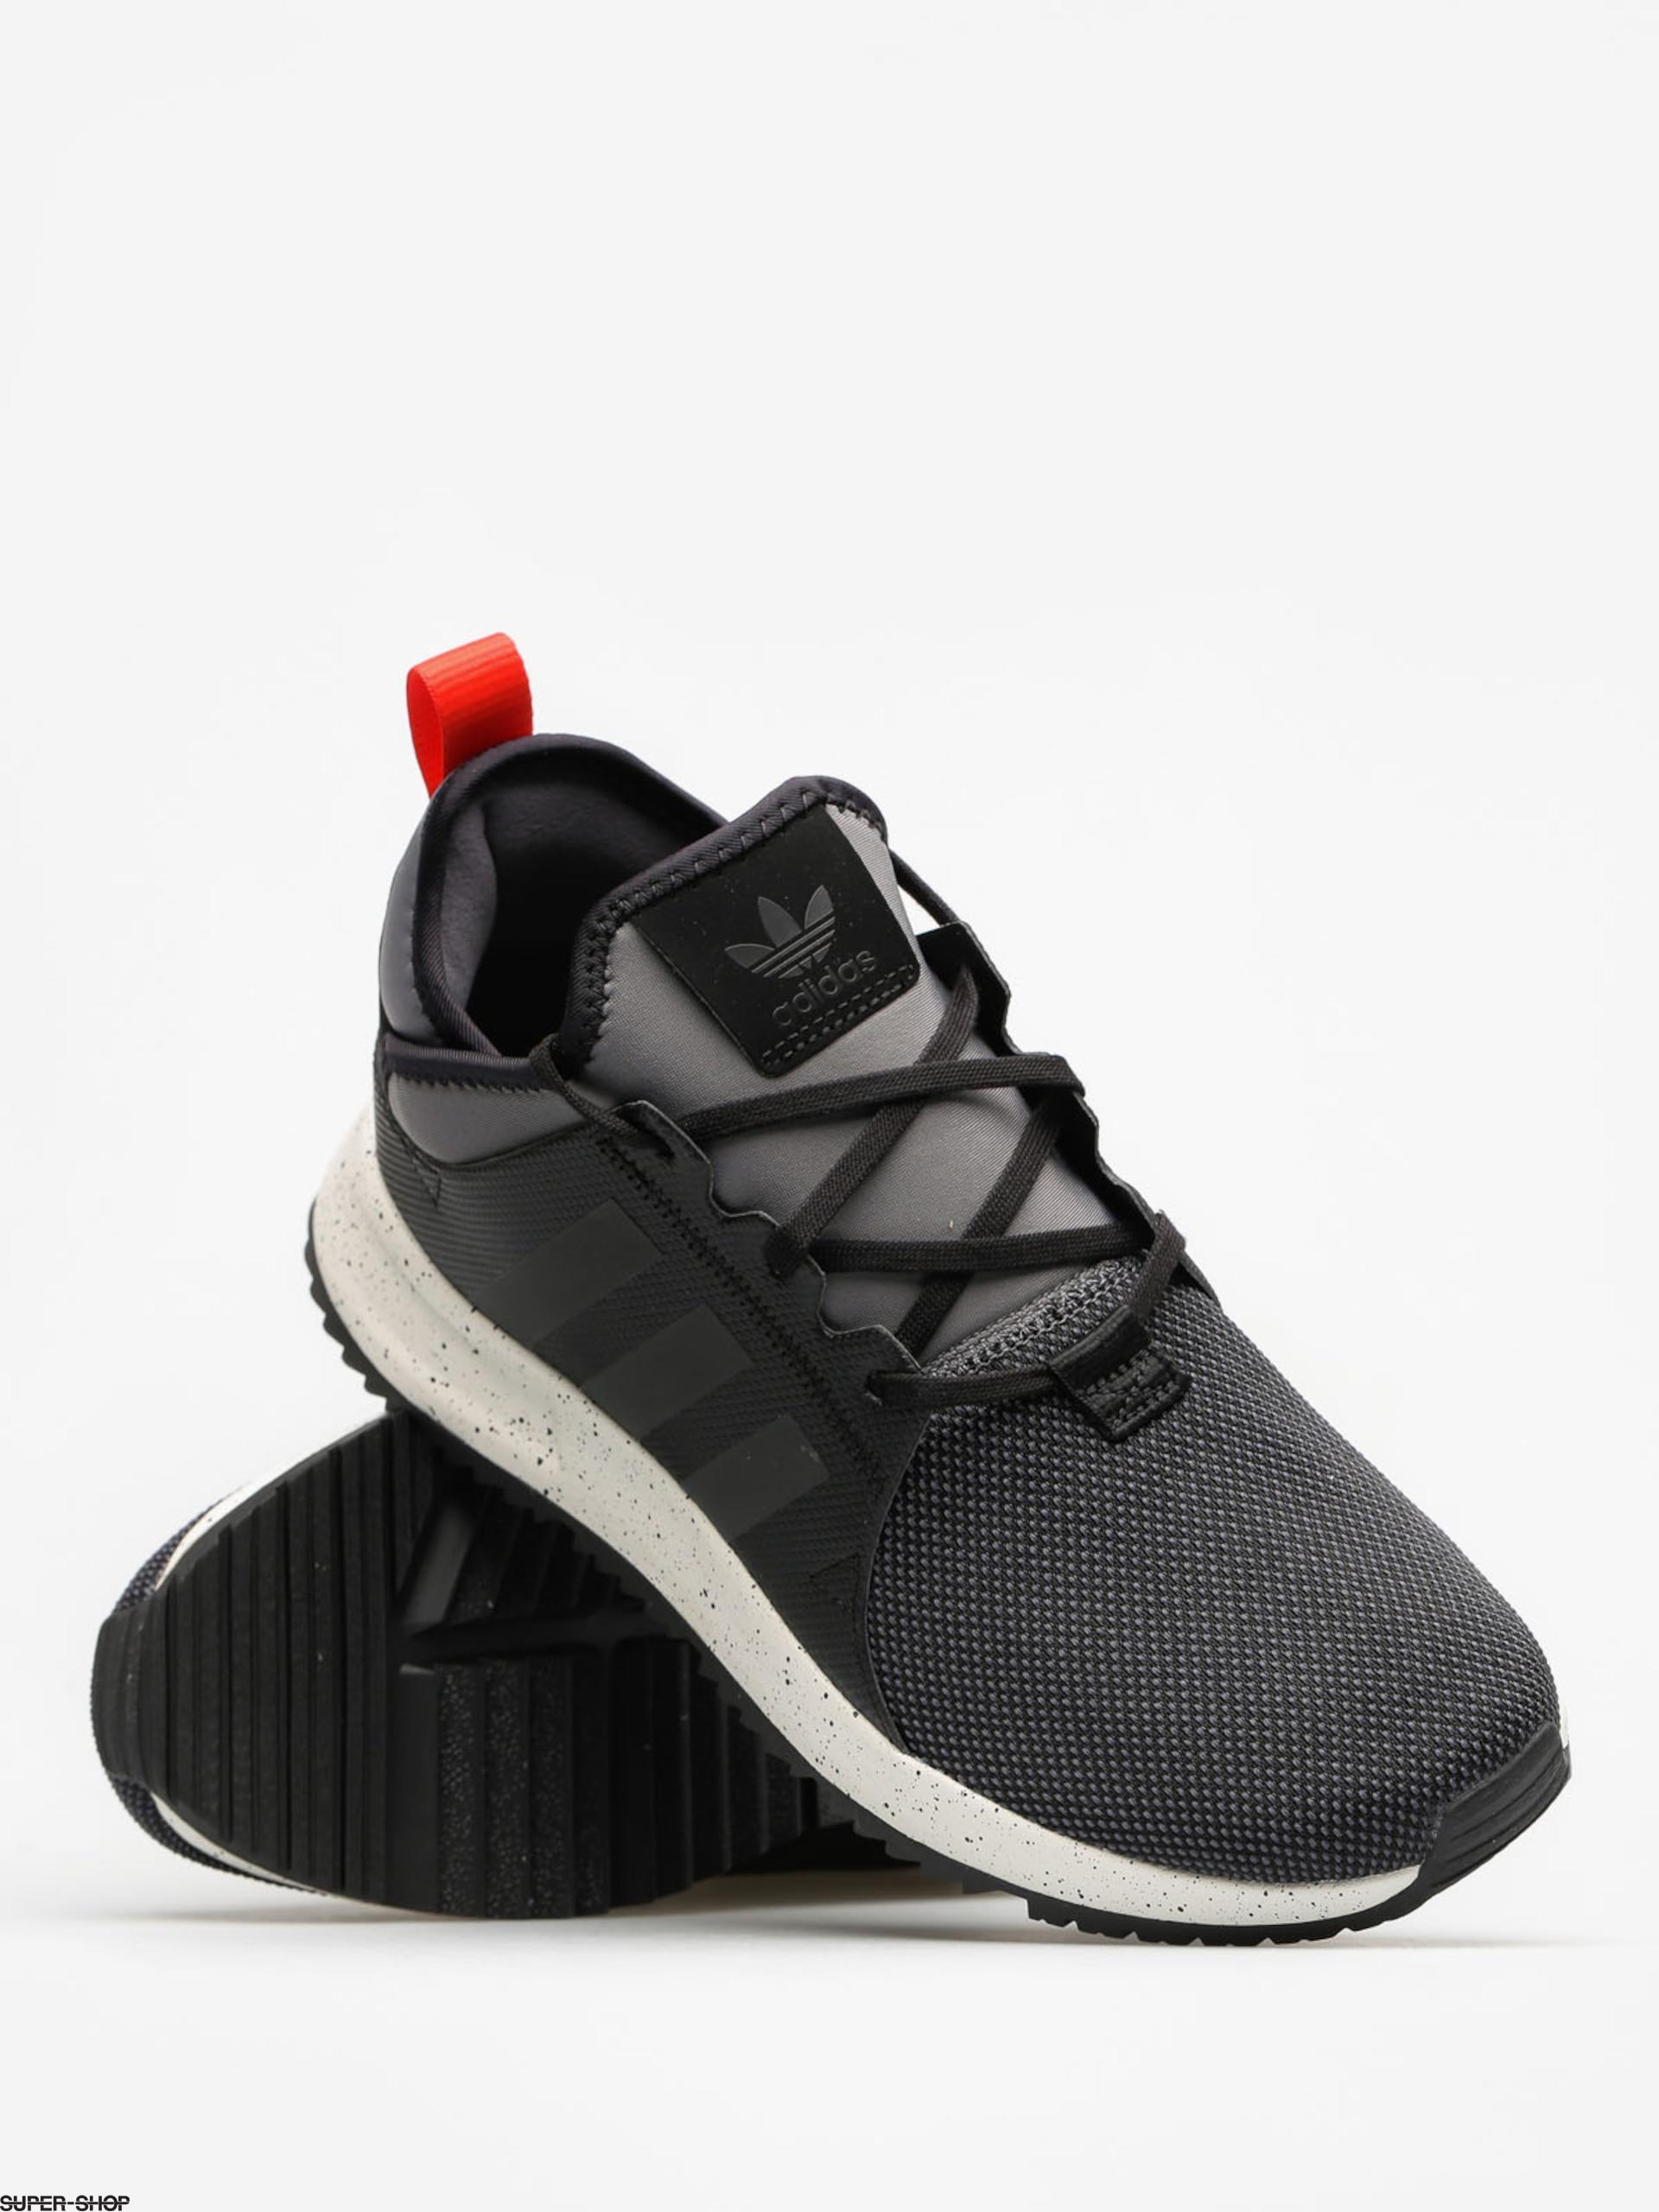 de6a07f26c821 876173-w1920-adidas-schuhe-x-plr-sneakerboot-cblack-cblack-grefiv.jpg